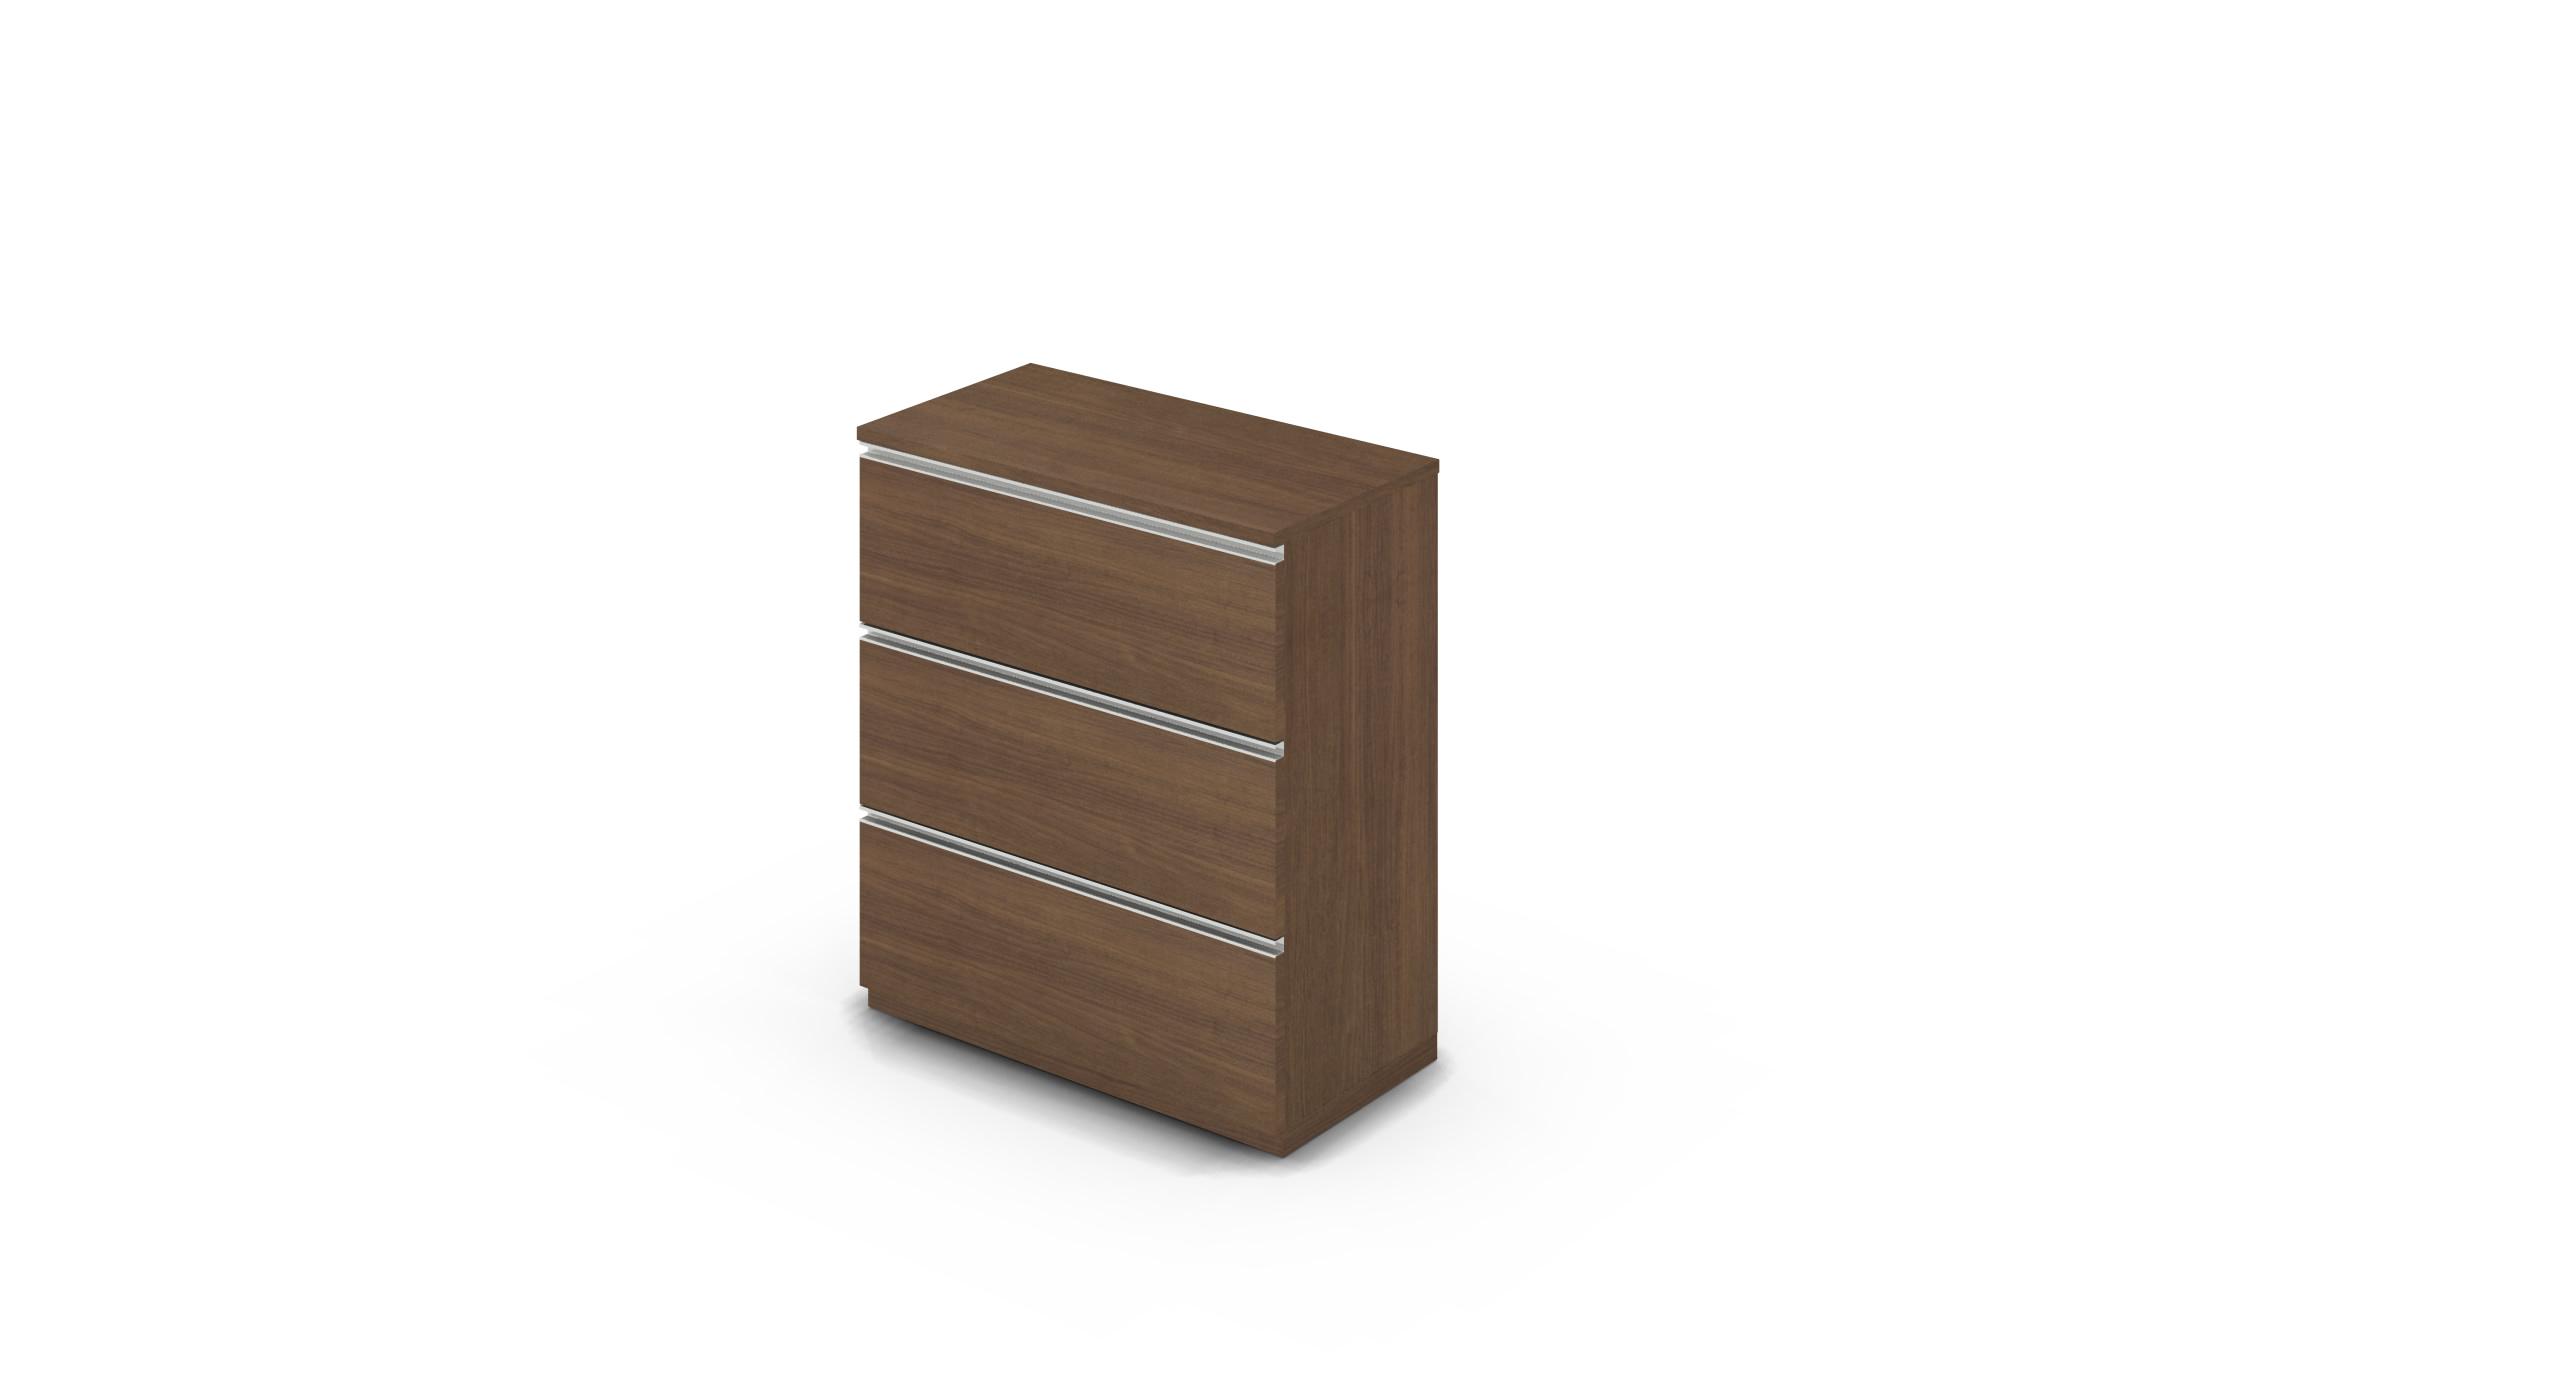 Cabinet_900x450x1125_DR_Walnut_Rail_NoCylinder